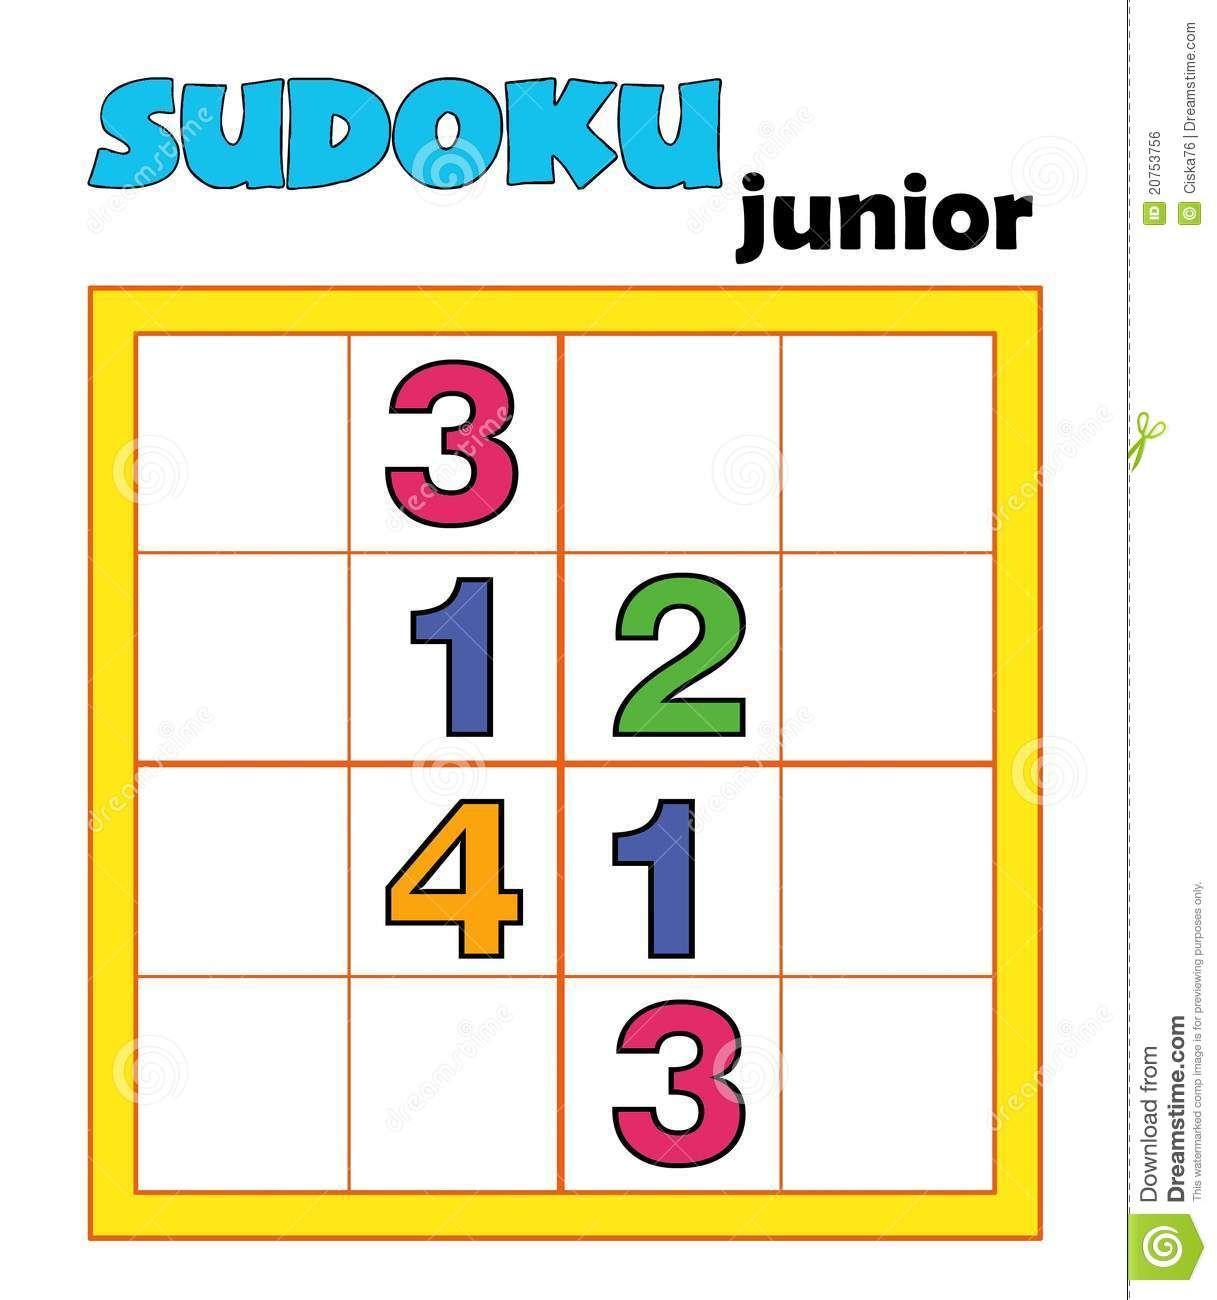 Gunilla Brånn Adlı Kullanıcının Lärare Panosundaki Pin avec Sudoku Junior À Imprimer